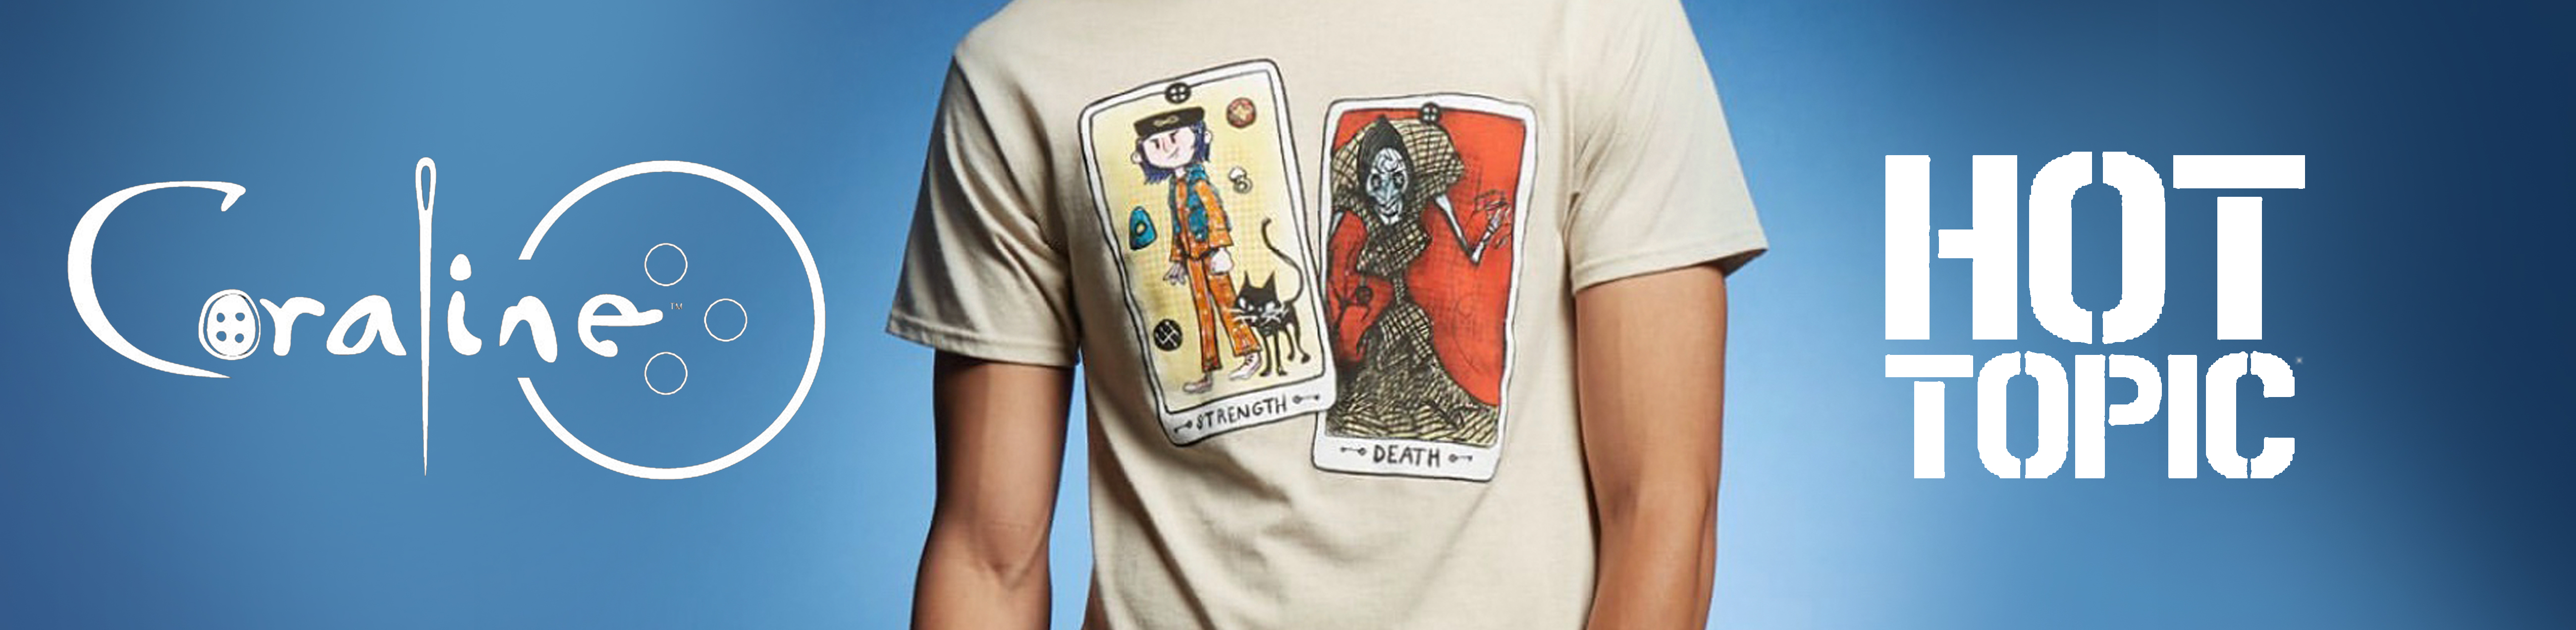 Coraline 10th Anniversary Shirt At Hot Topic